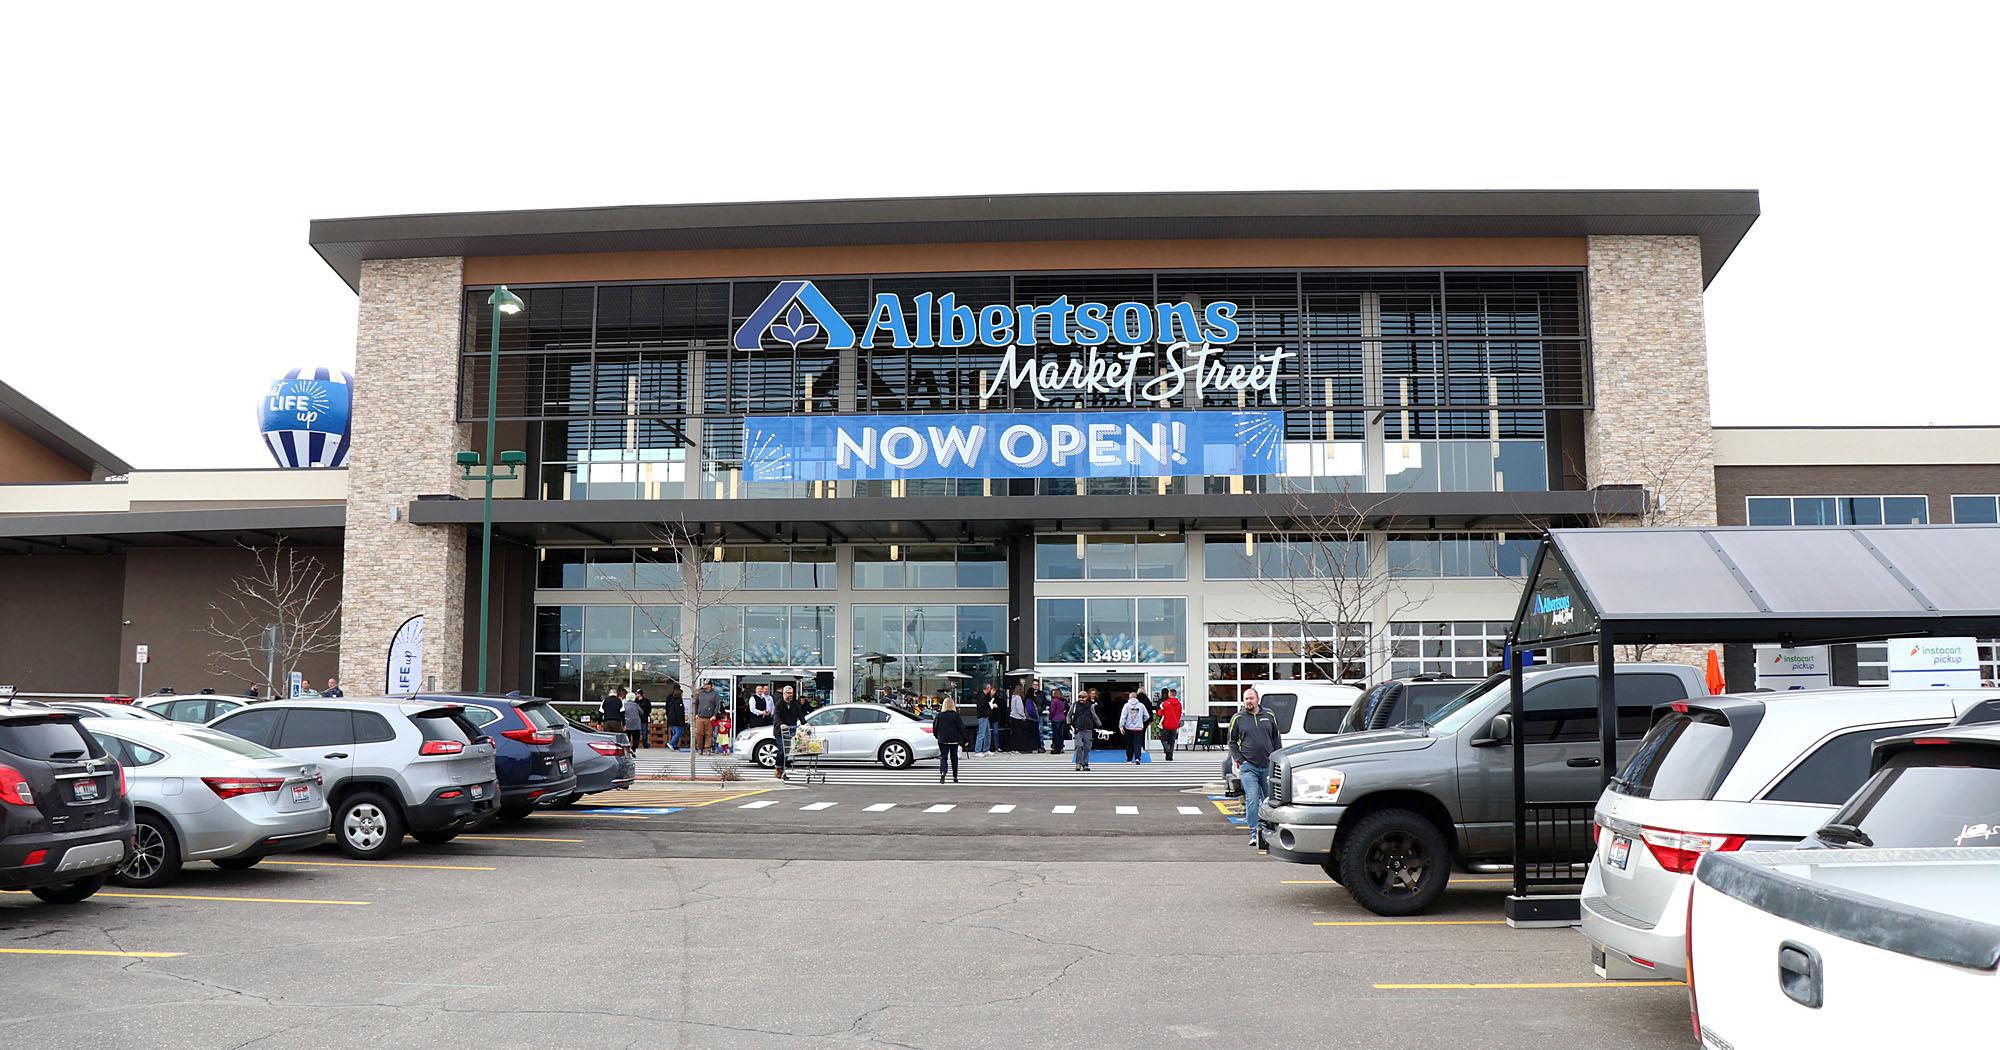 Albertsons Storefront